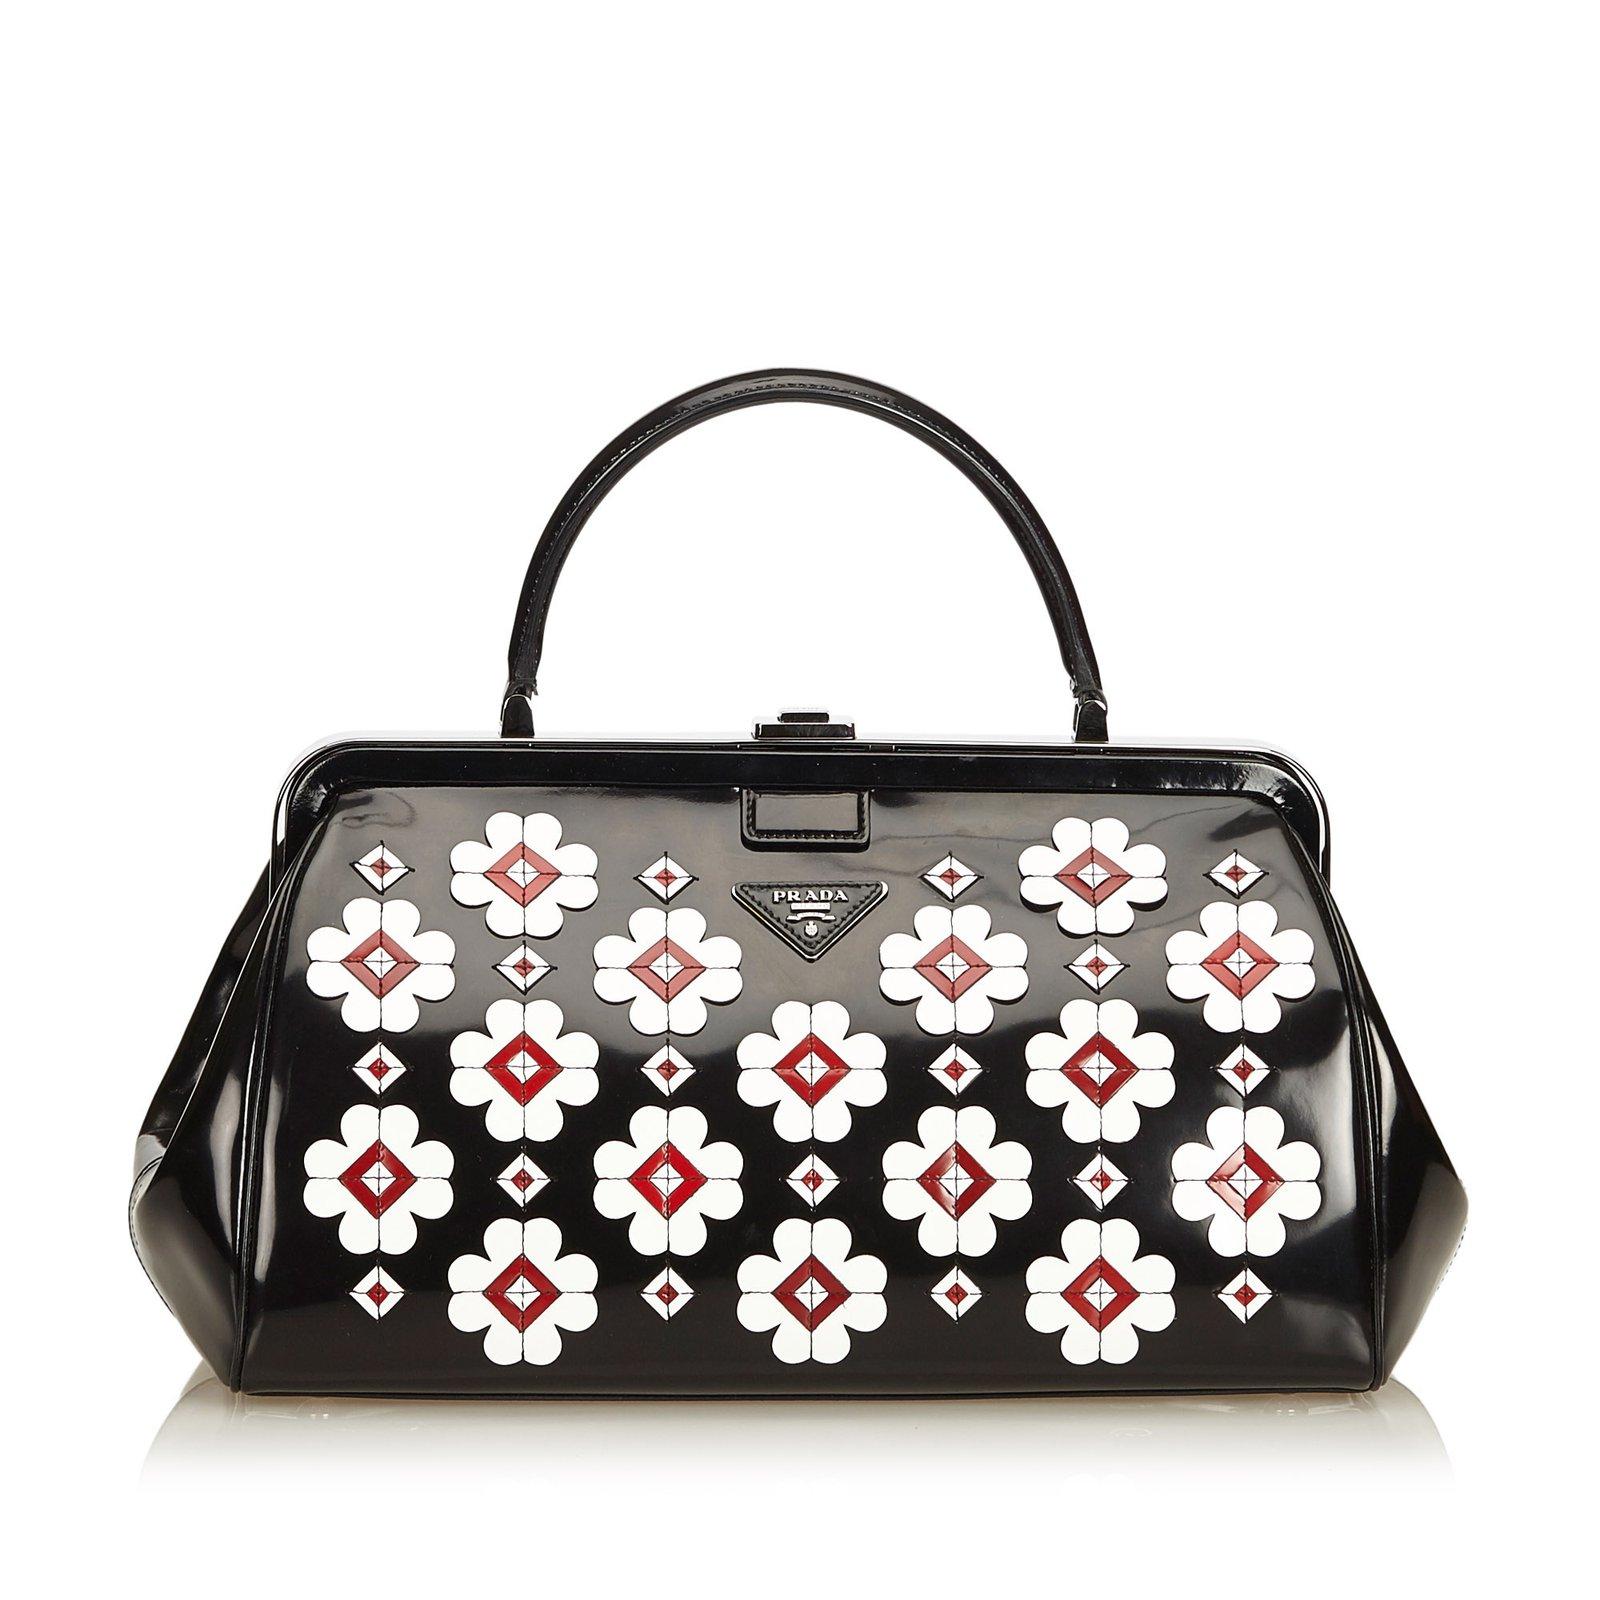 0f0fd178660b ... cheap prada brushed flower applique doctor bag handbags leatherpatent  leather blackmultiple colors ref e7142 b40b5